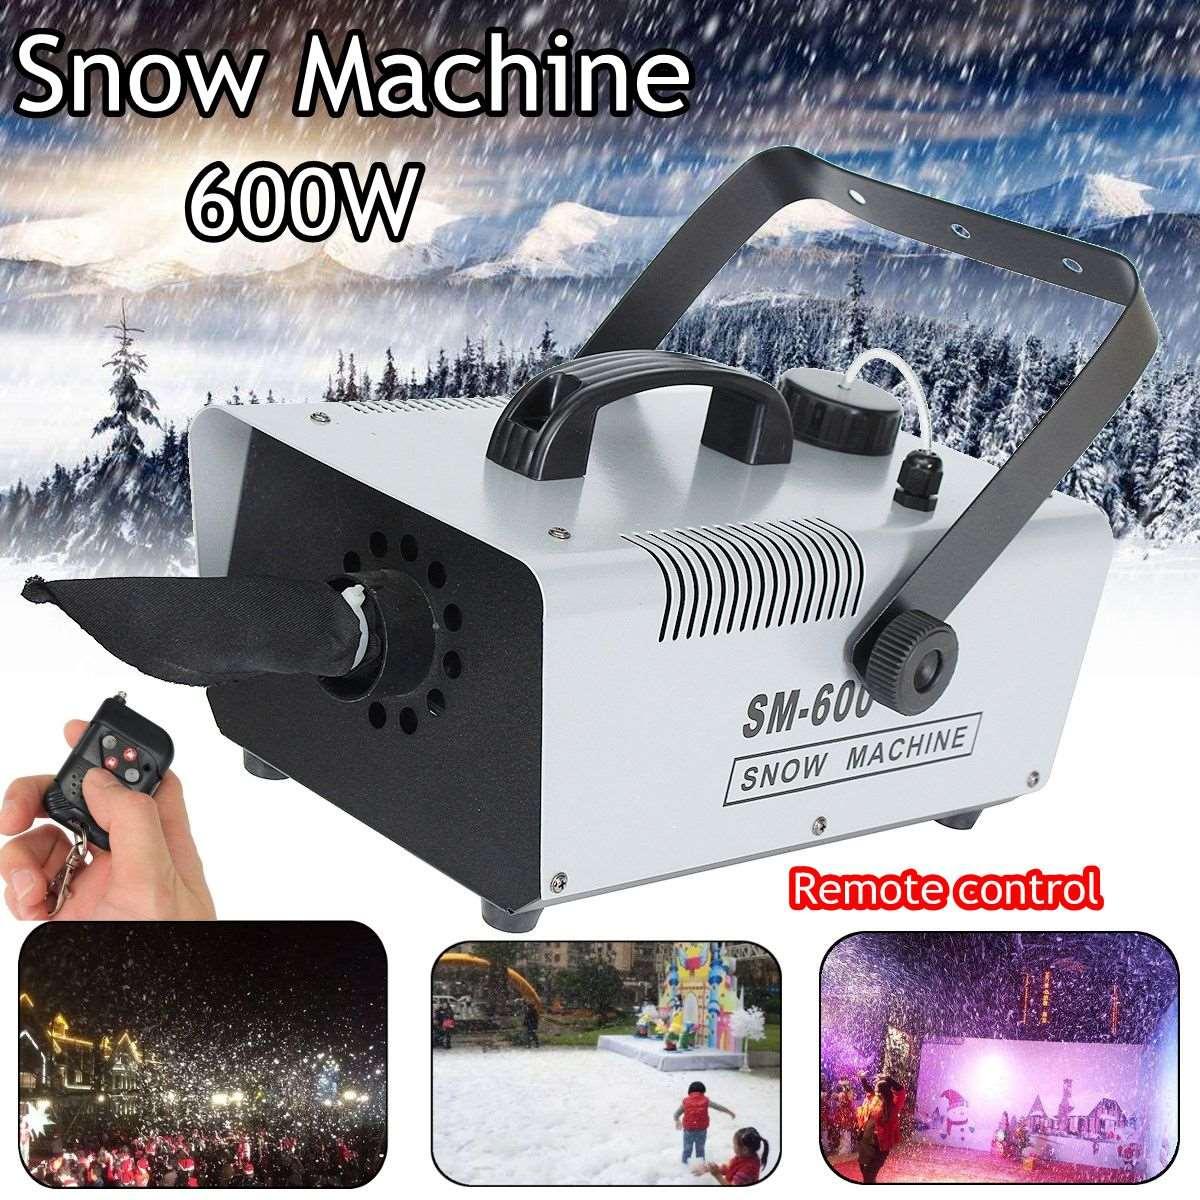 110V/220V Snow 600W Pack Snow Machine Effect with 1.5L Snow Fluid & Wireless Remote